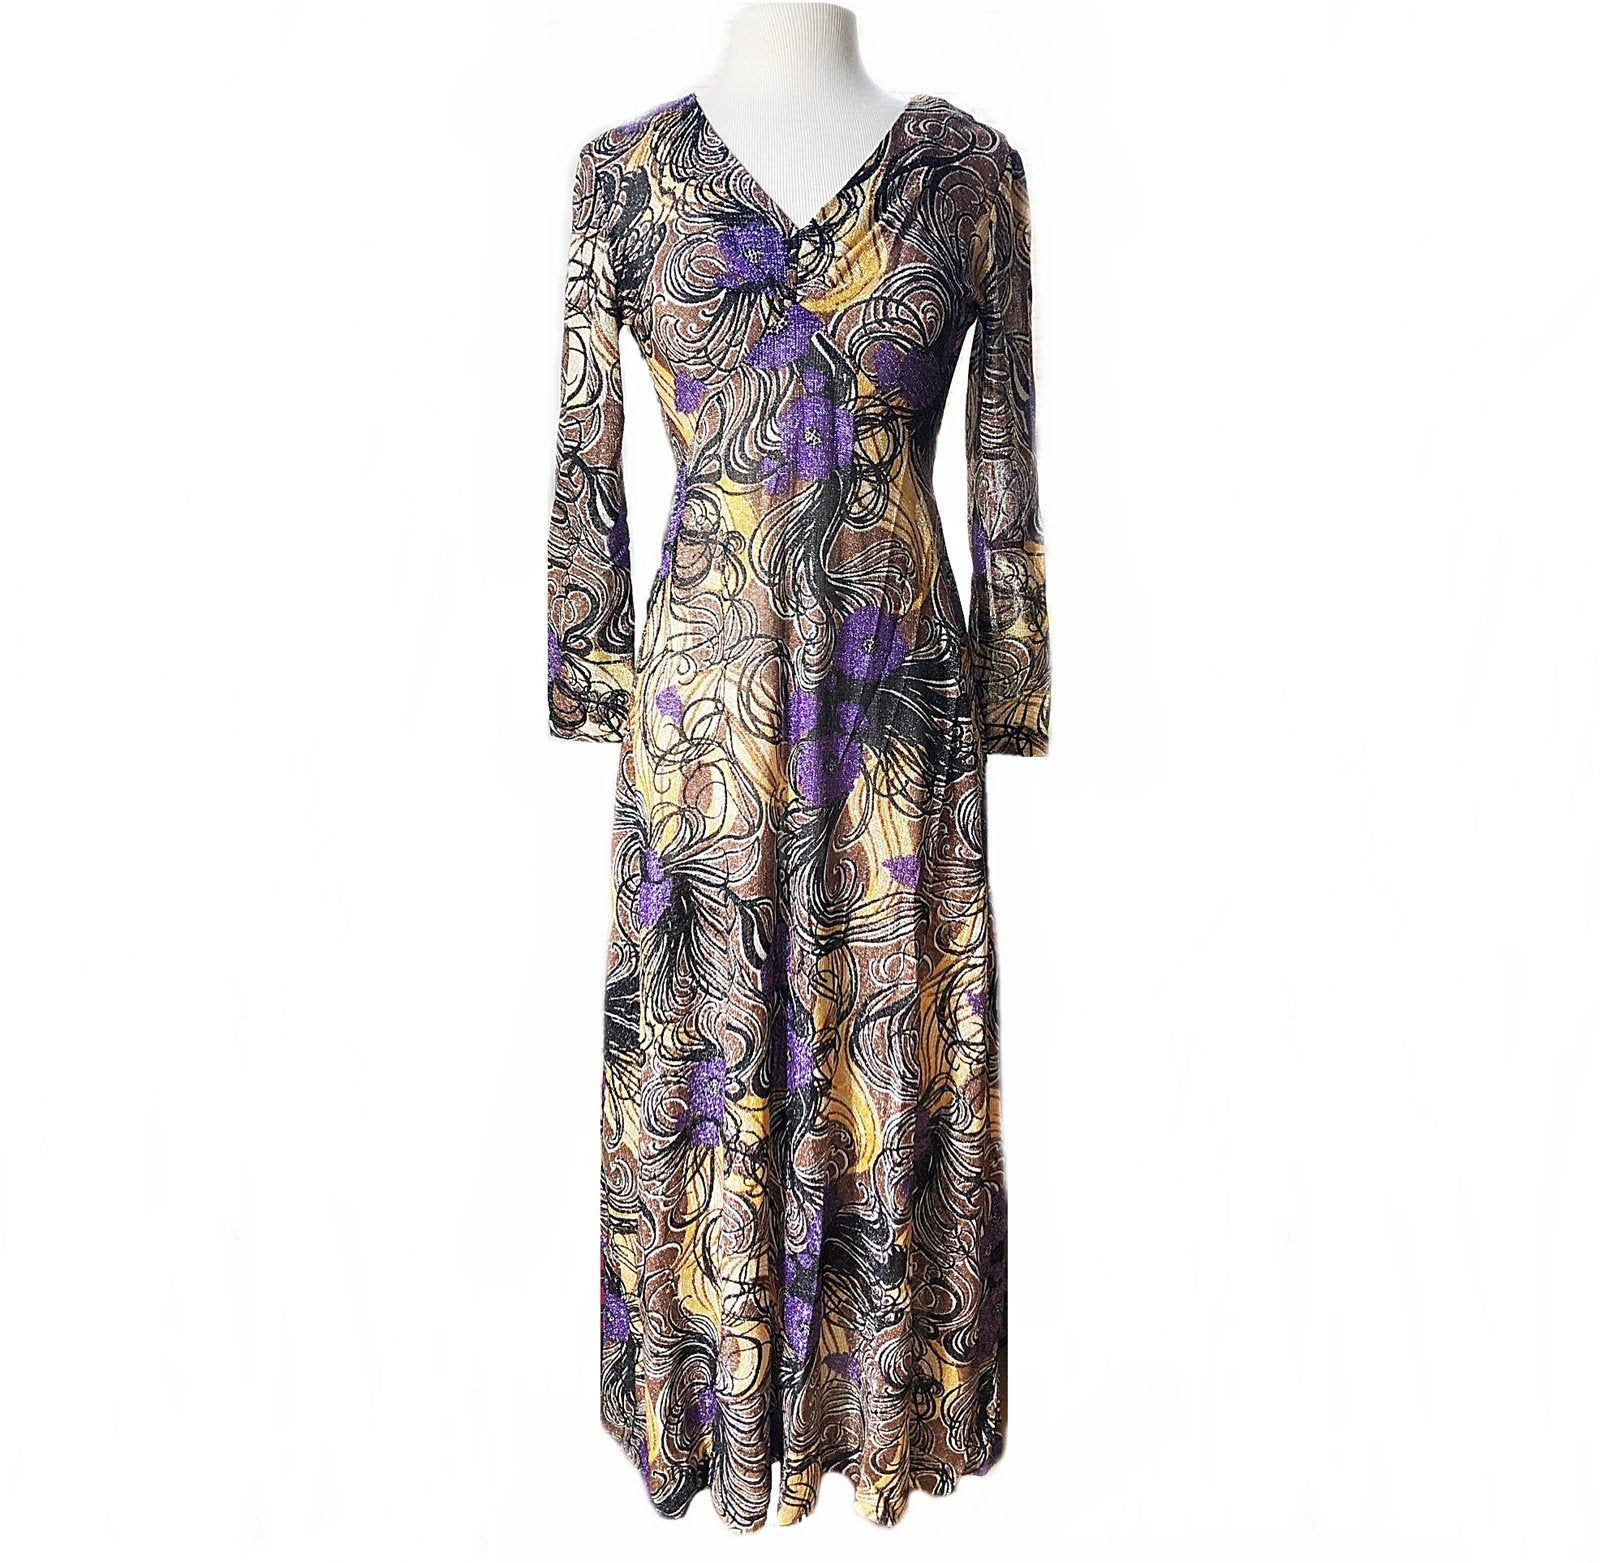 Vintage 70s Lame Maxi Dress Glitter Metallic Thread Dress Etsy Maxi Dress Lurex Dress Dresses [ 1563 x 1600 Pixel ]